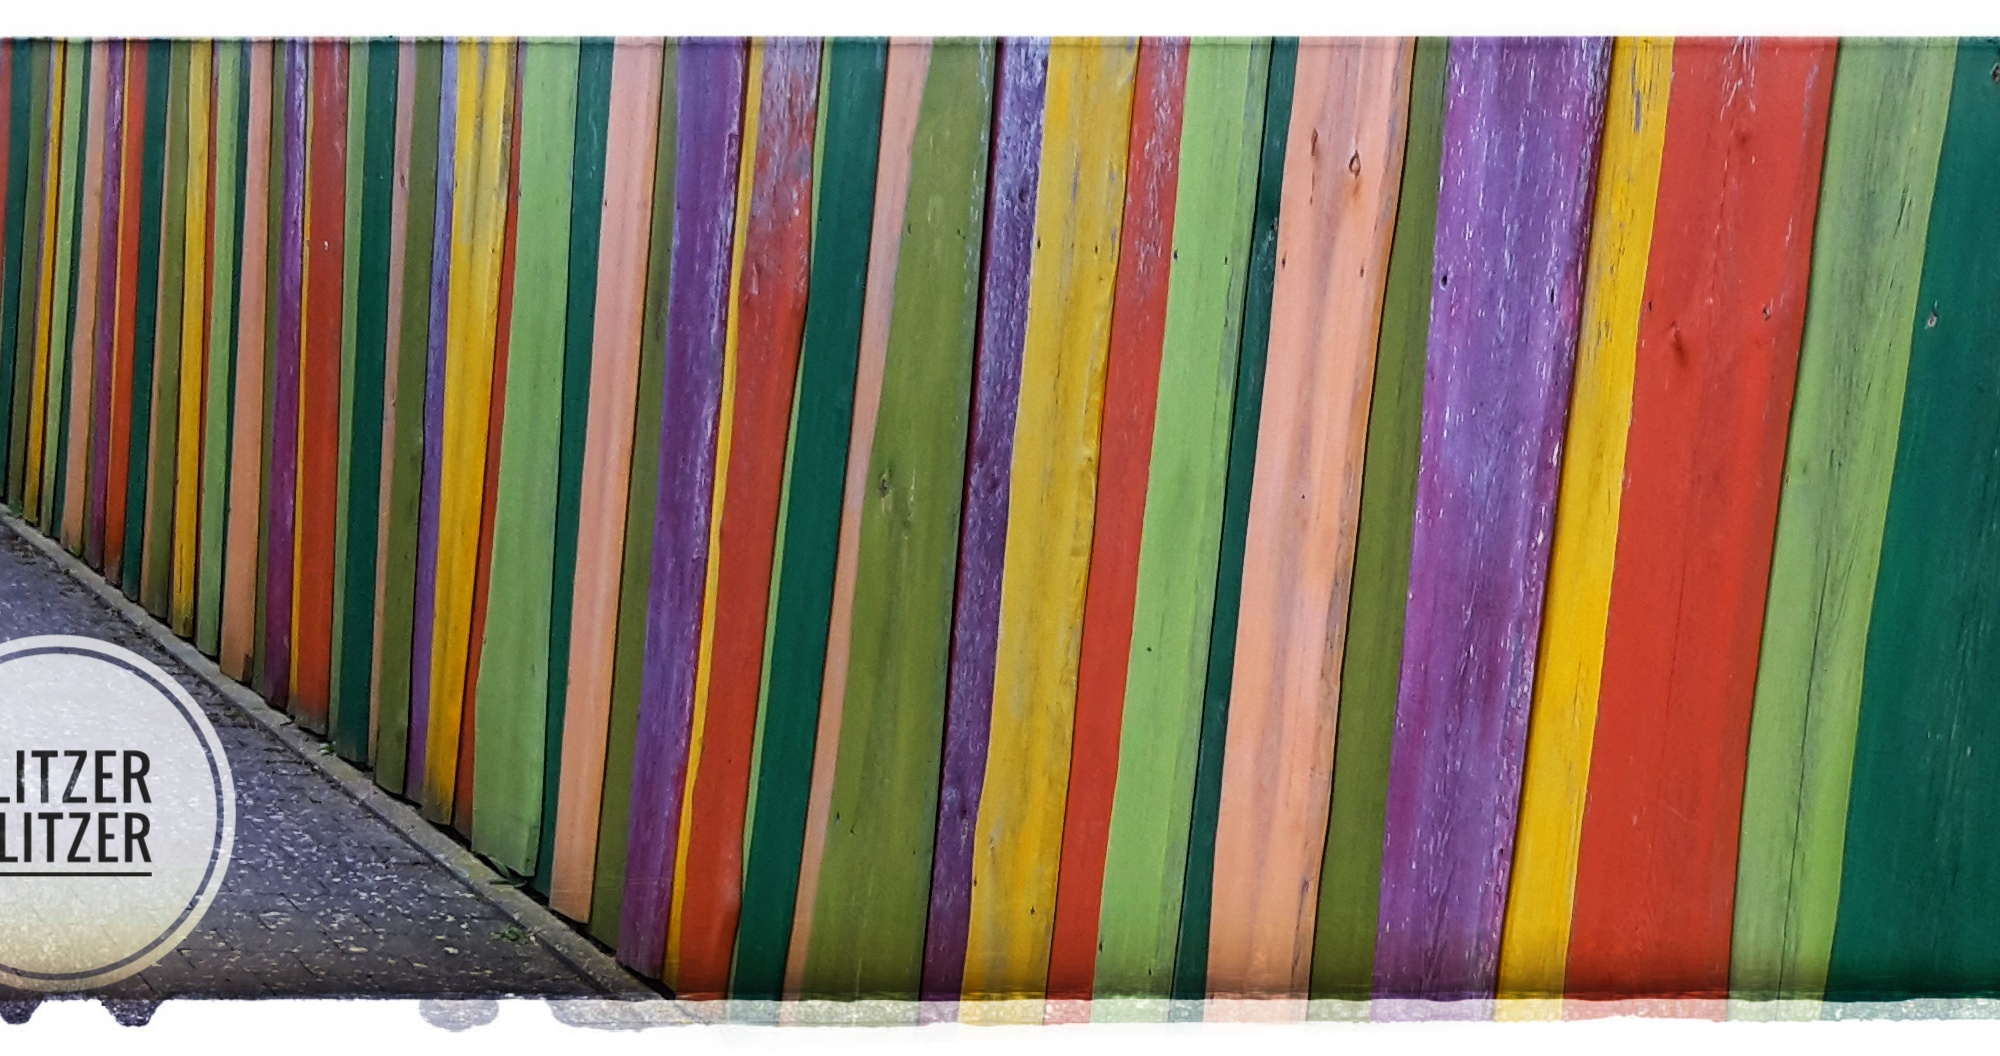 Ungeschliffener Holzzaun in rot, gelb, grün, froschgrün, lila, rosa